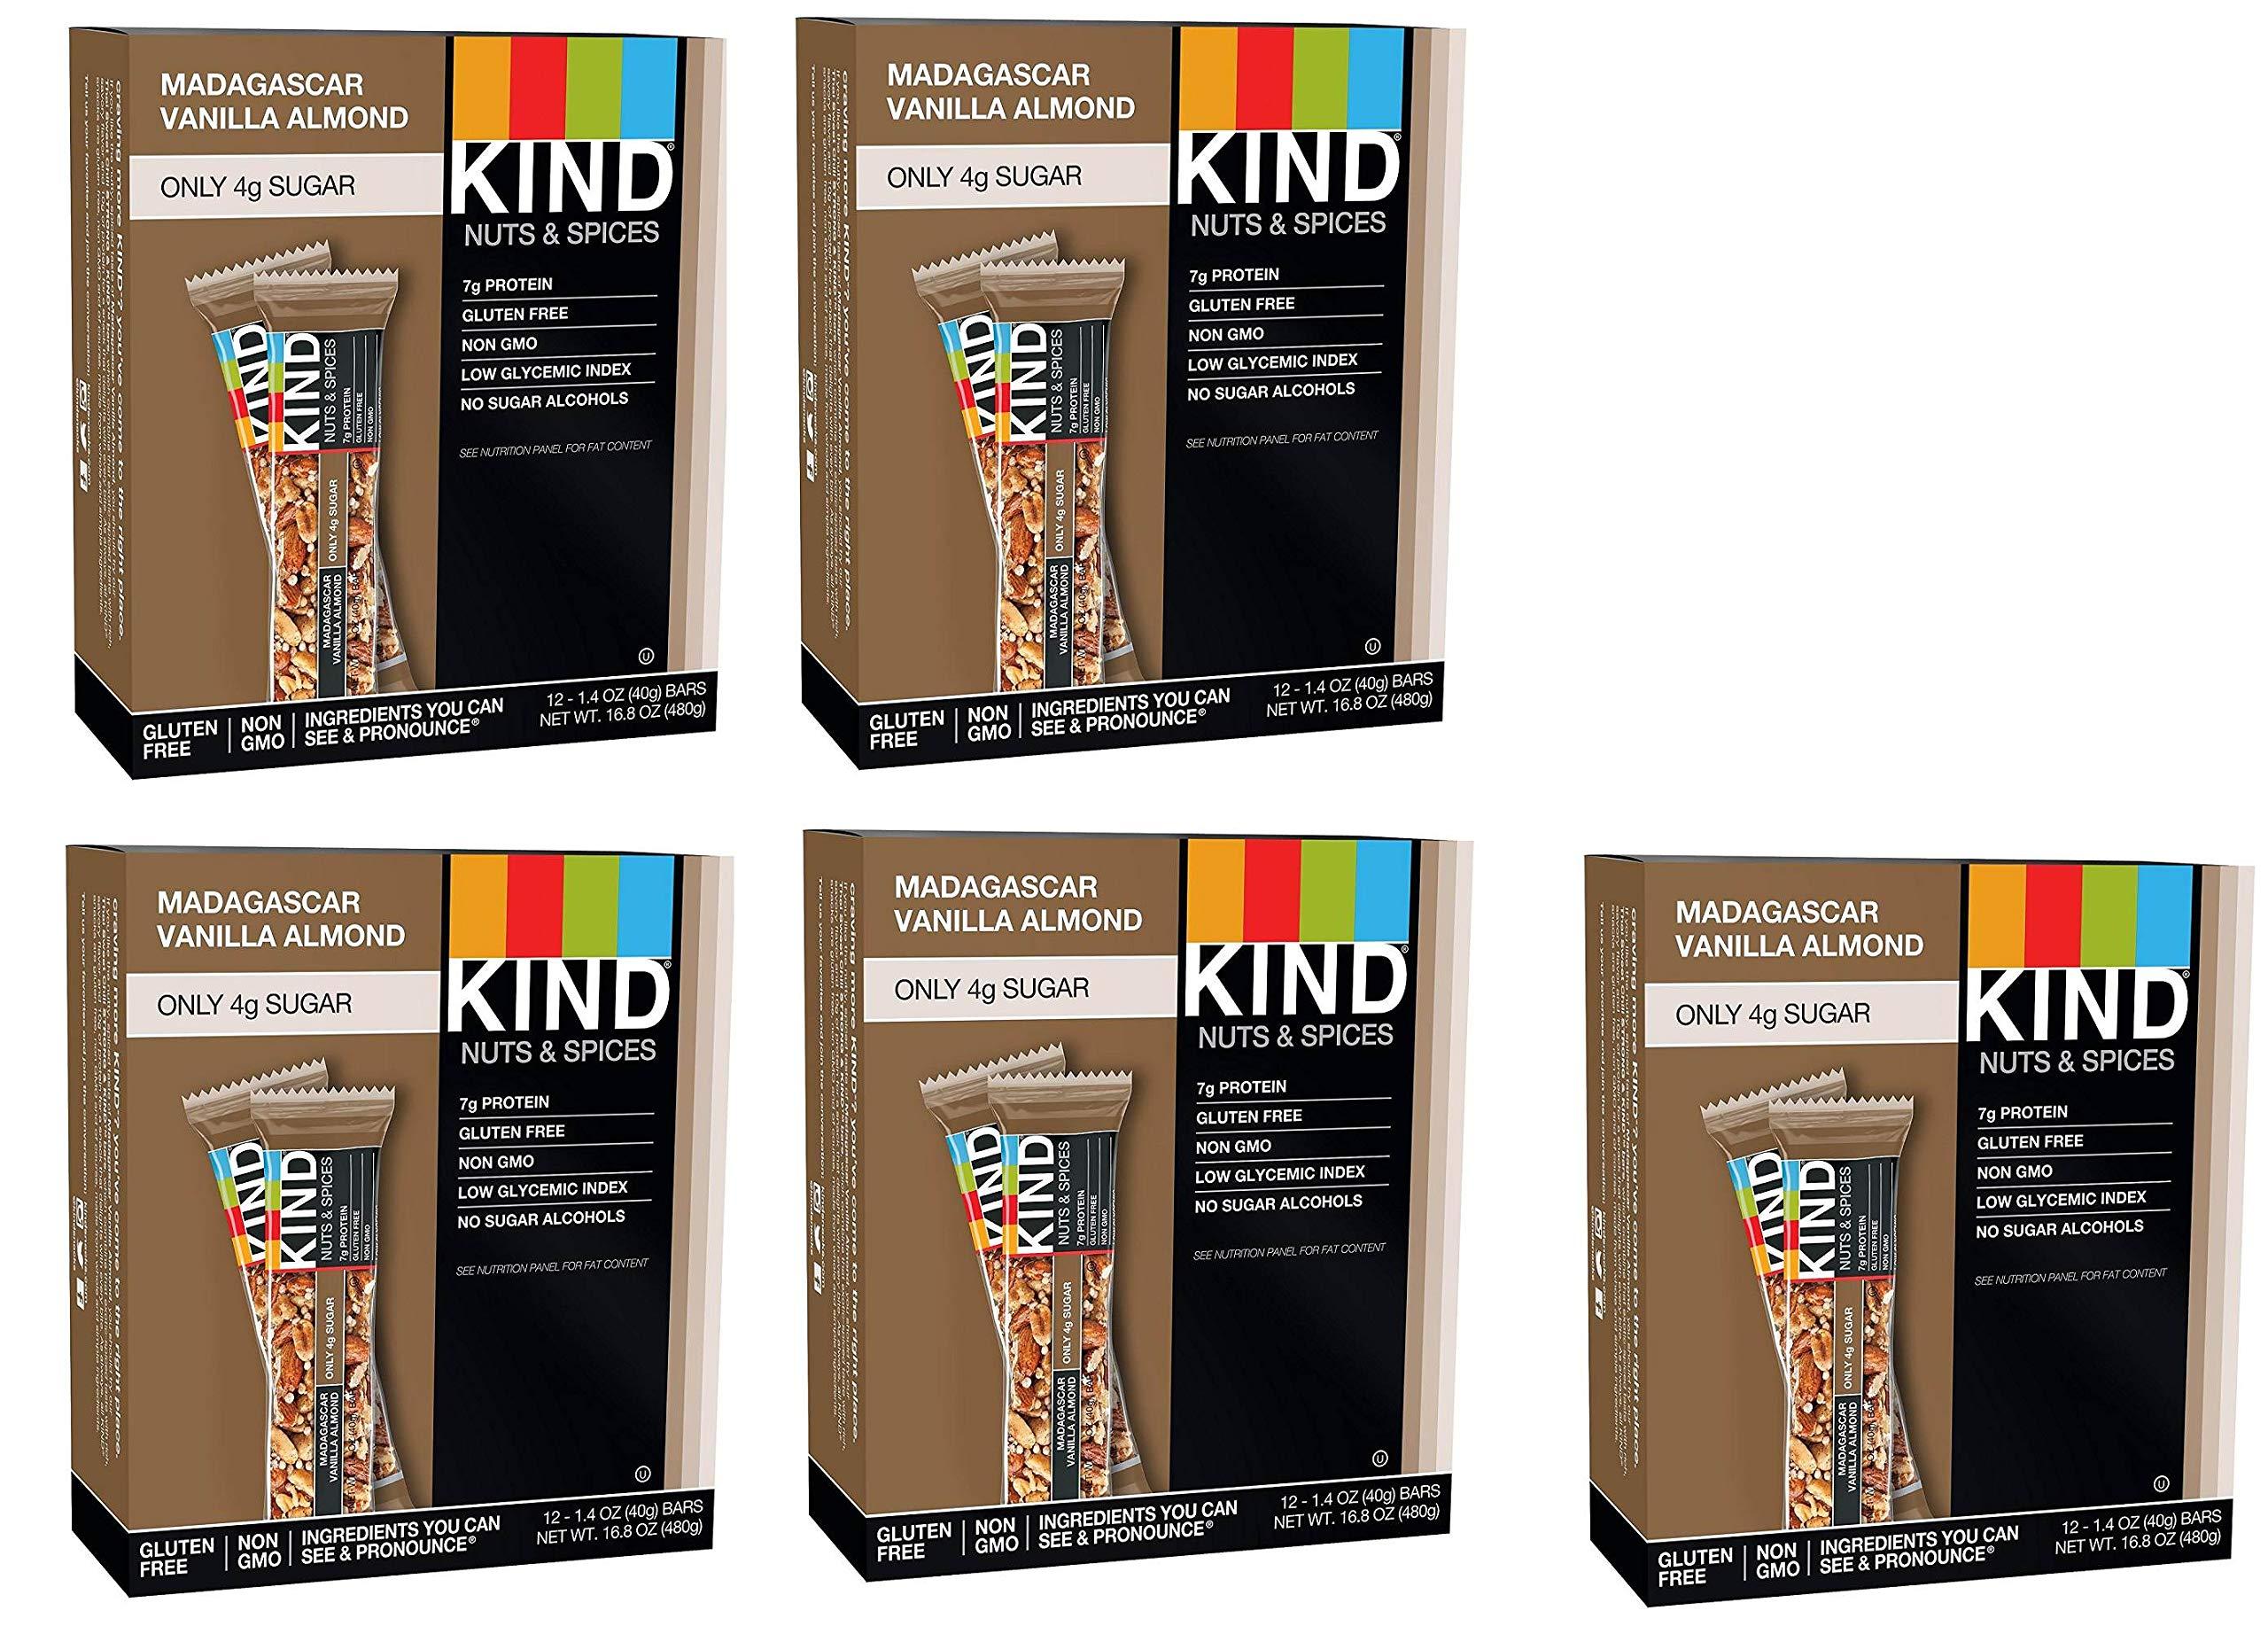 KIND Bars, Madagascar Vanilla Almond, Gluten Free, Low Sugar, 1.4oz, 60 Bars